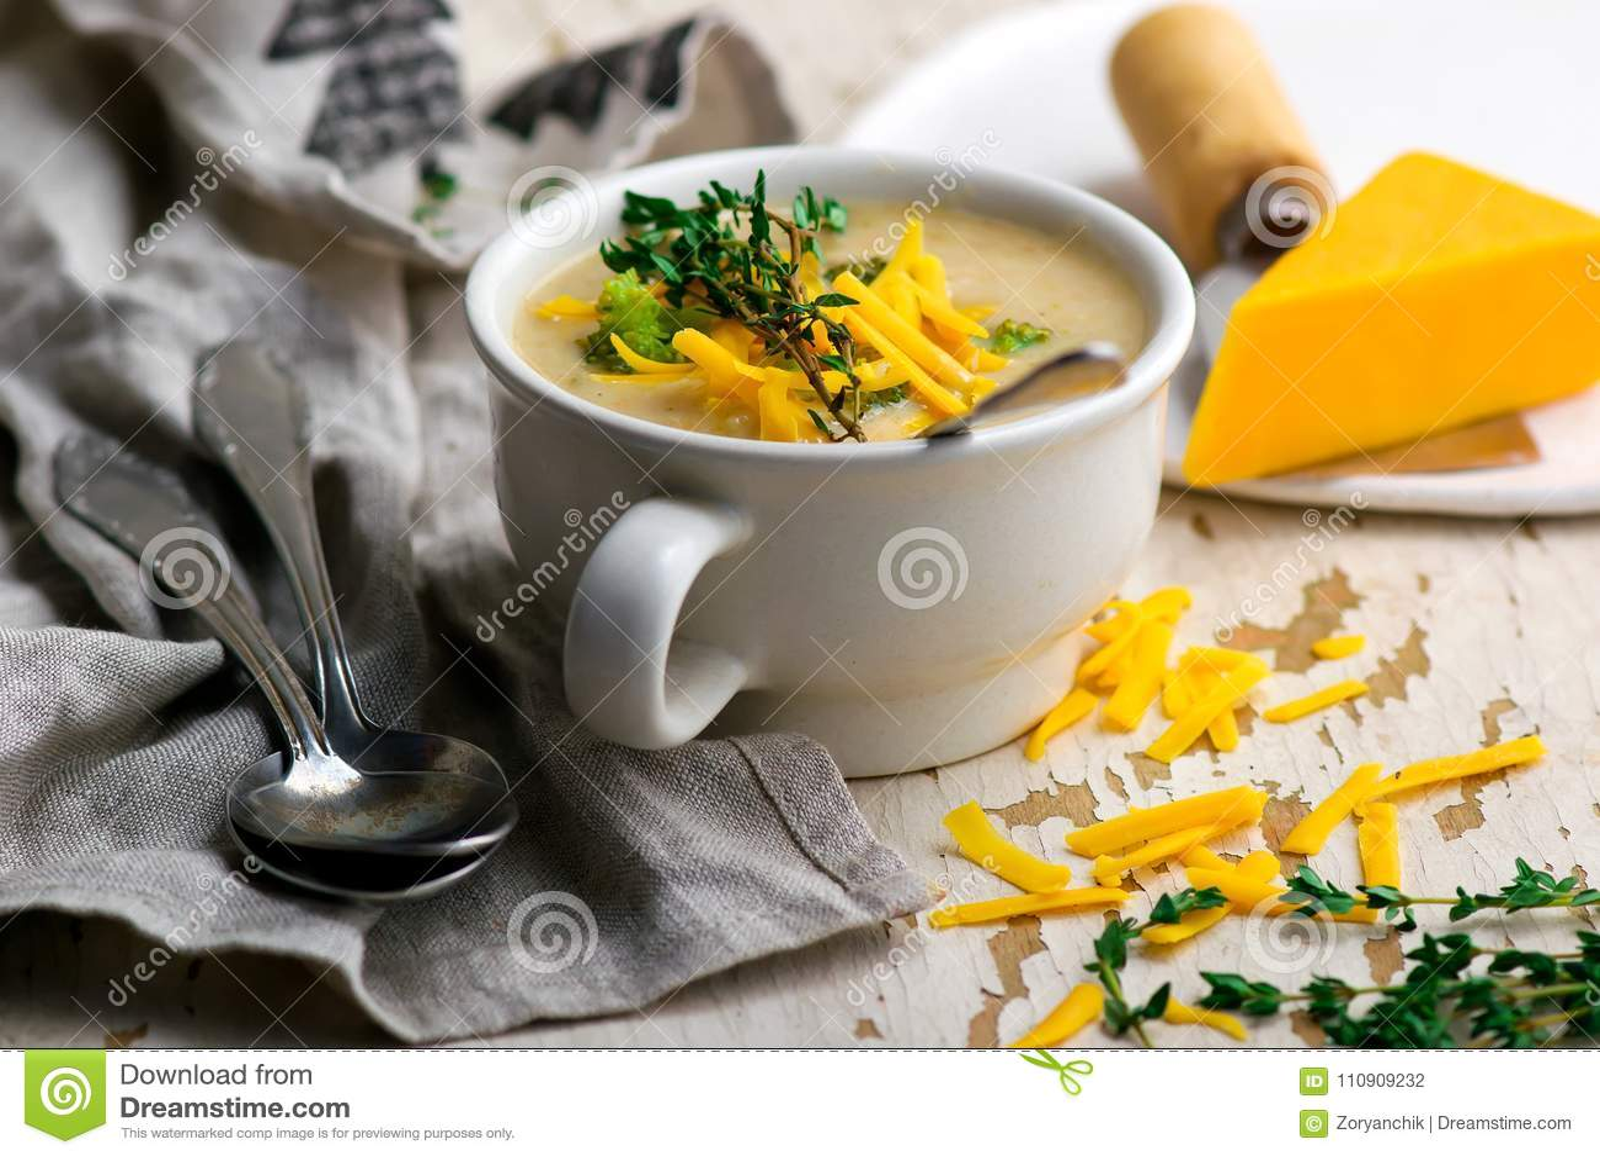 Broccoli cheddar chicken and dumpling soup